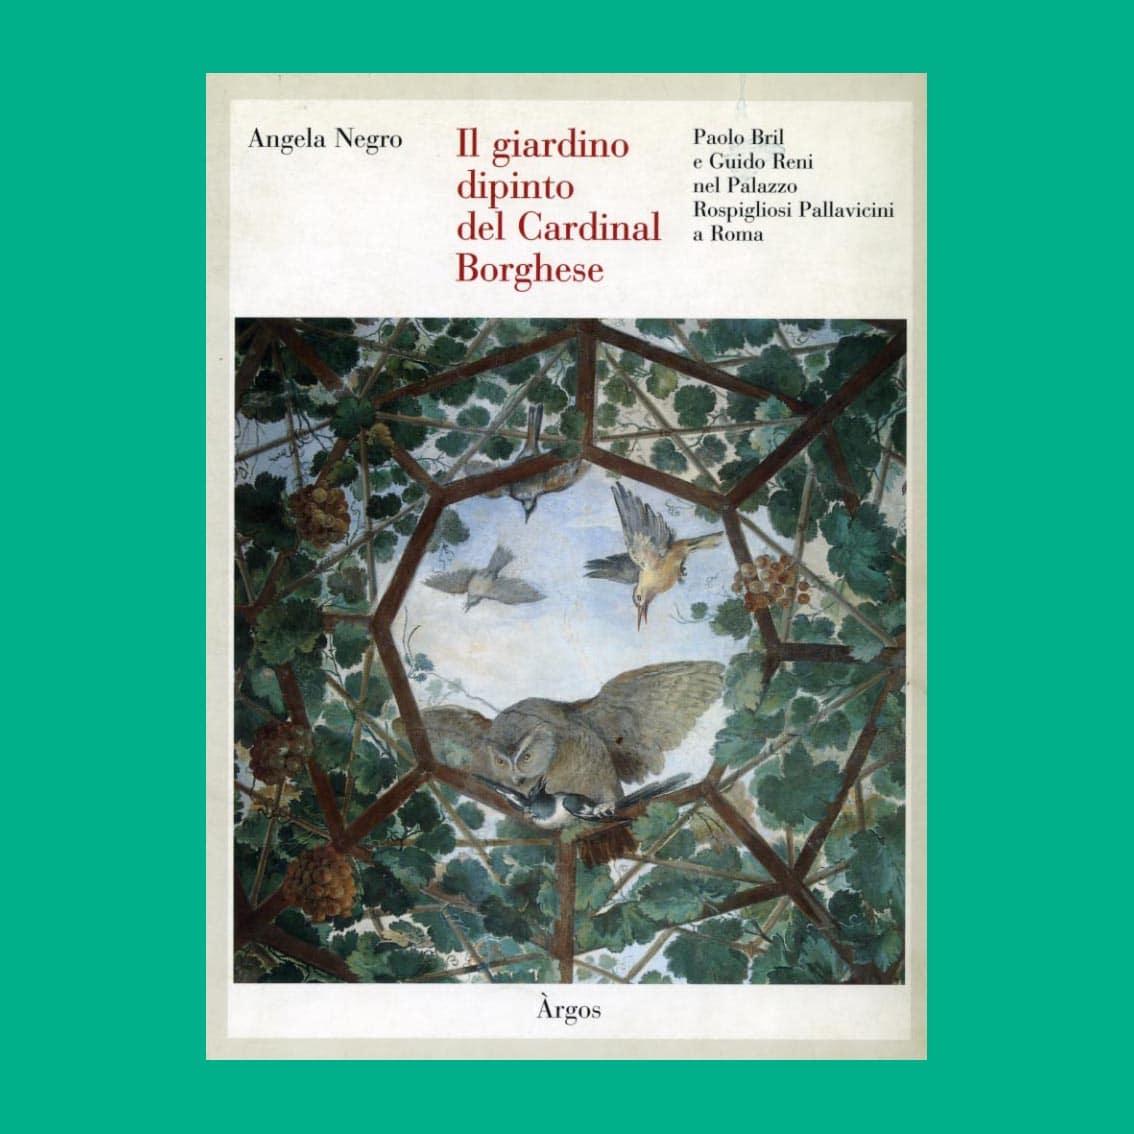 https://cbccoop.it/app/uploads/2017/06/Il-giardino-dipinto-del-Cardinal-Borghese.jpg